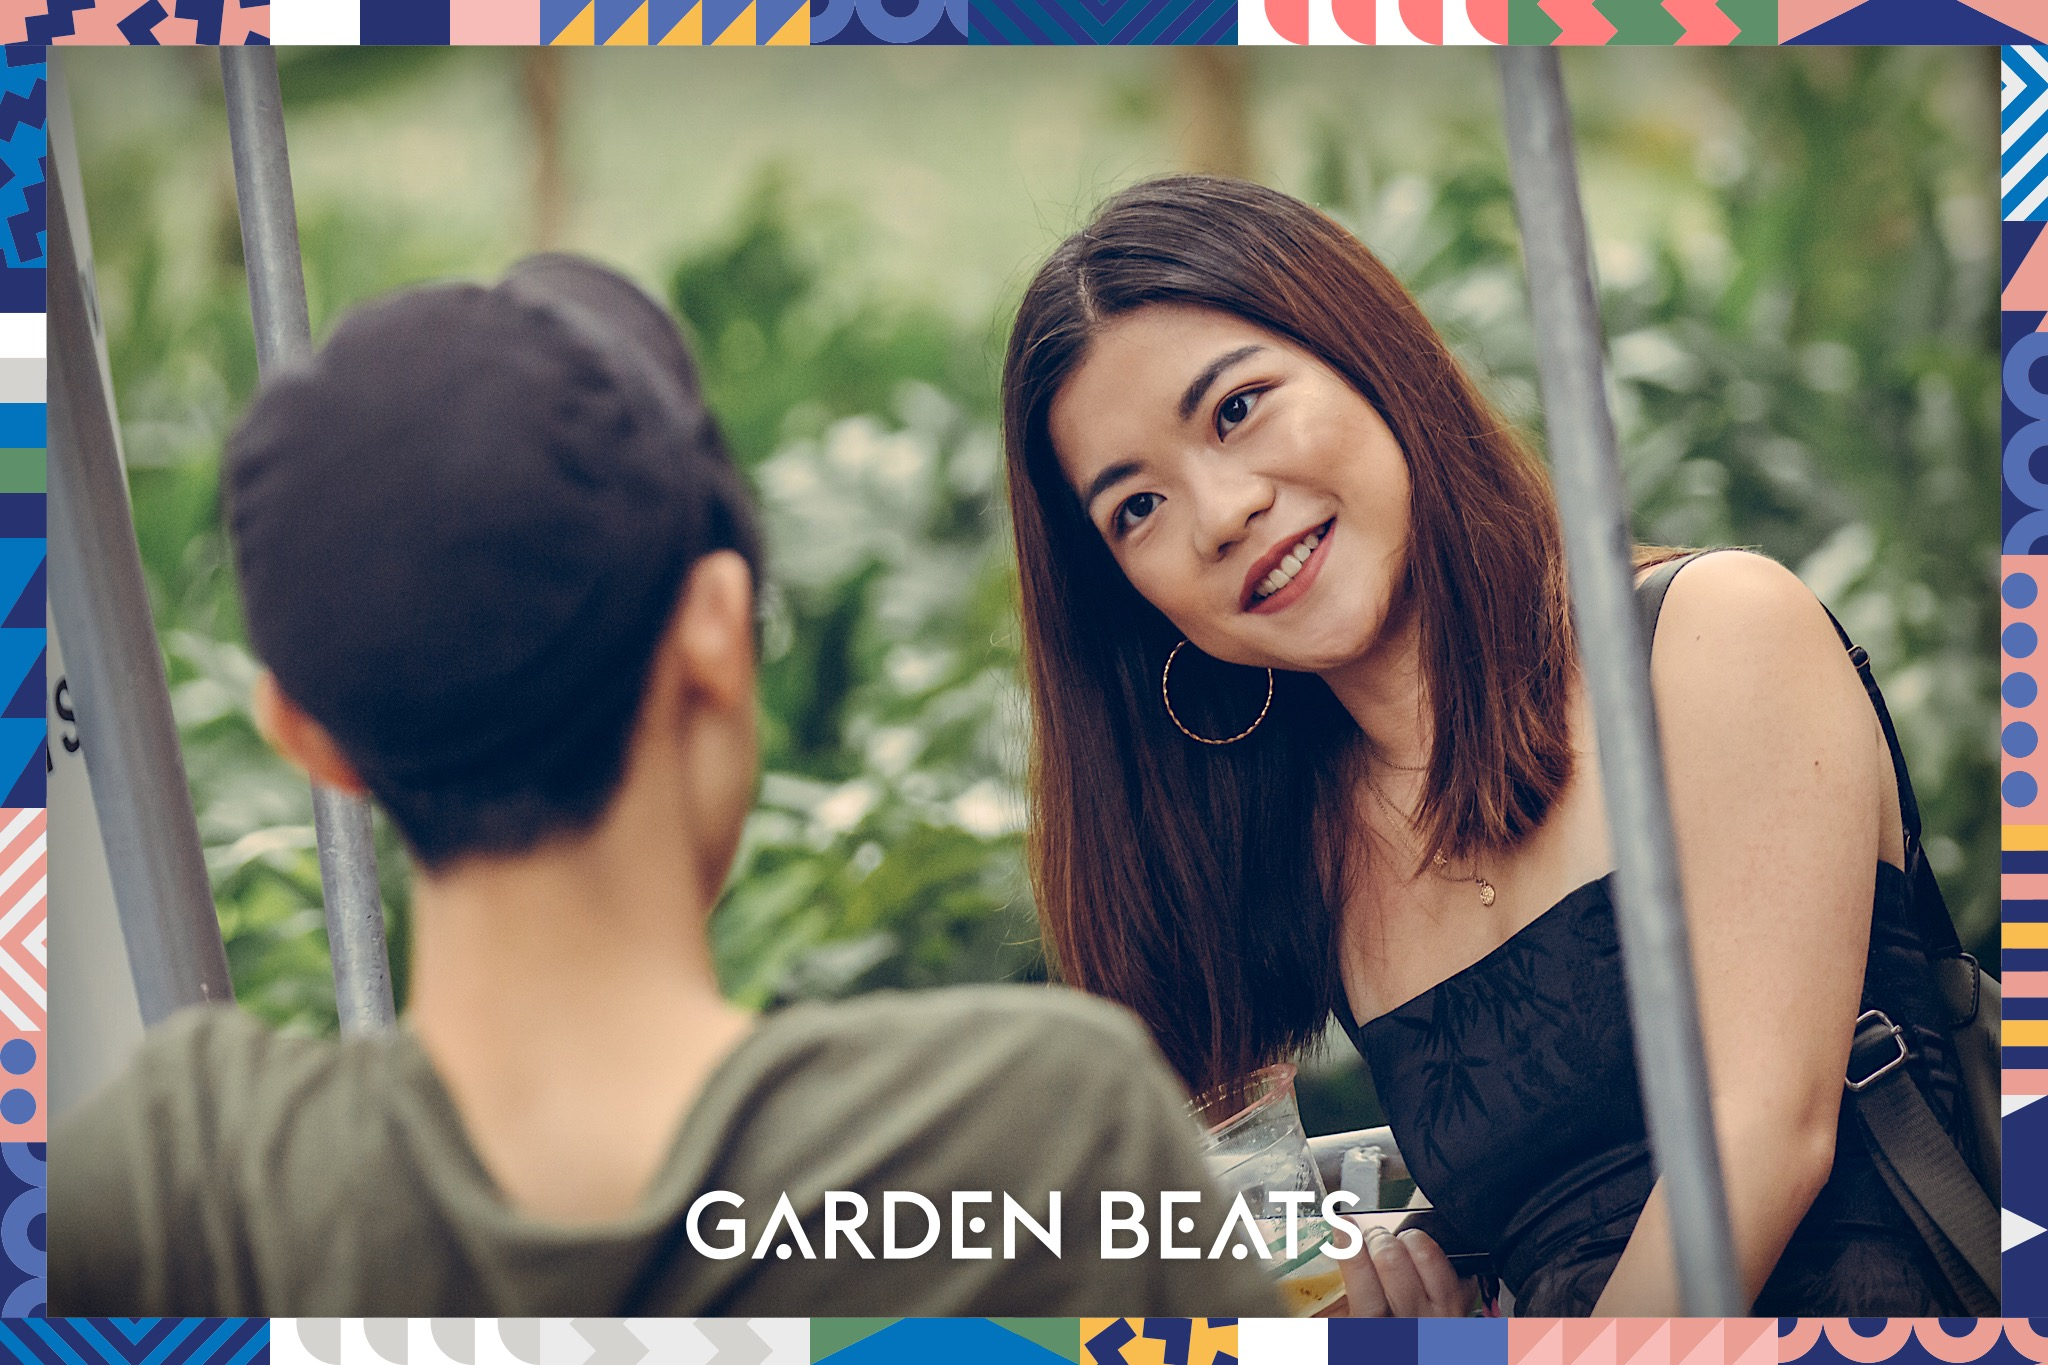 03032018_GardenBeats_Colossal503_Watermarked.jpg